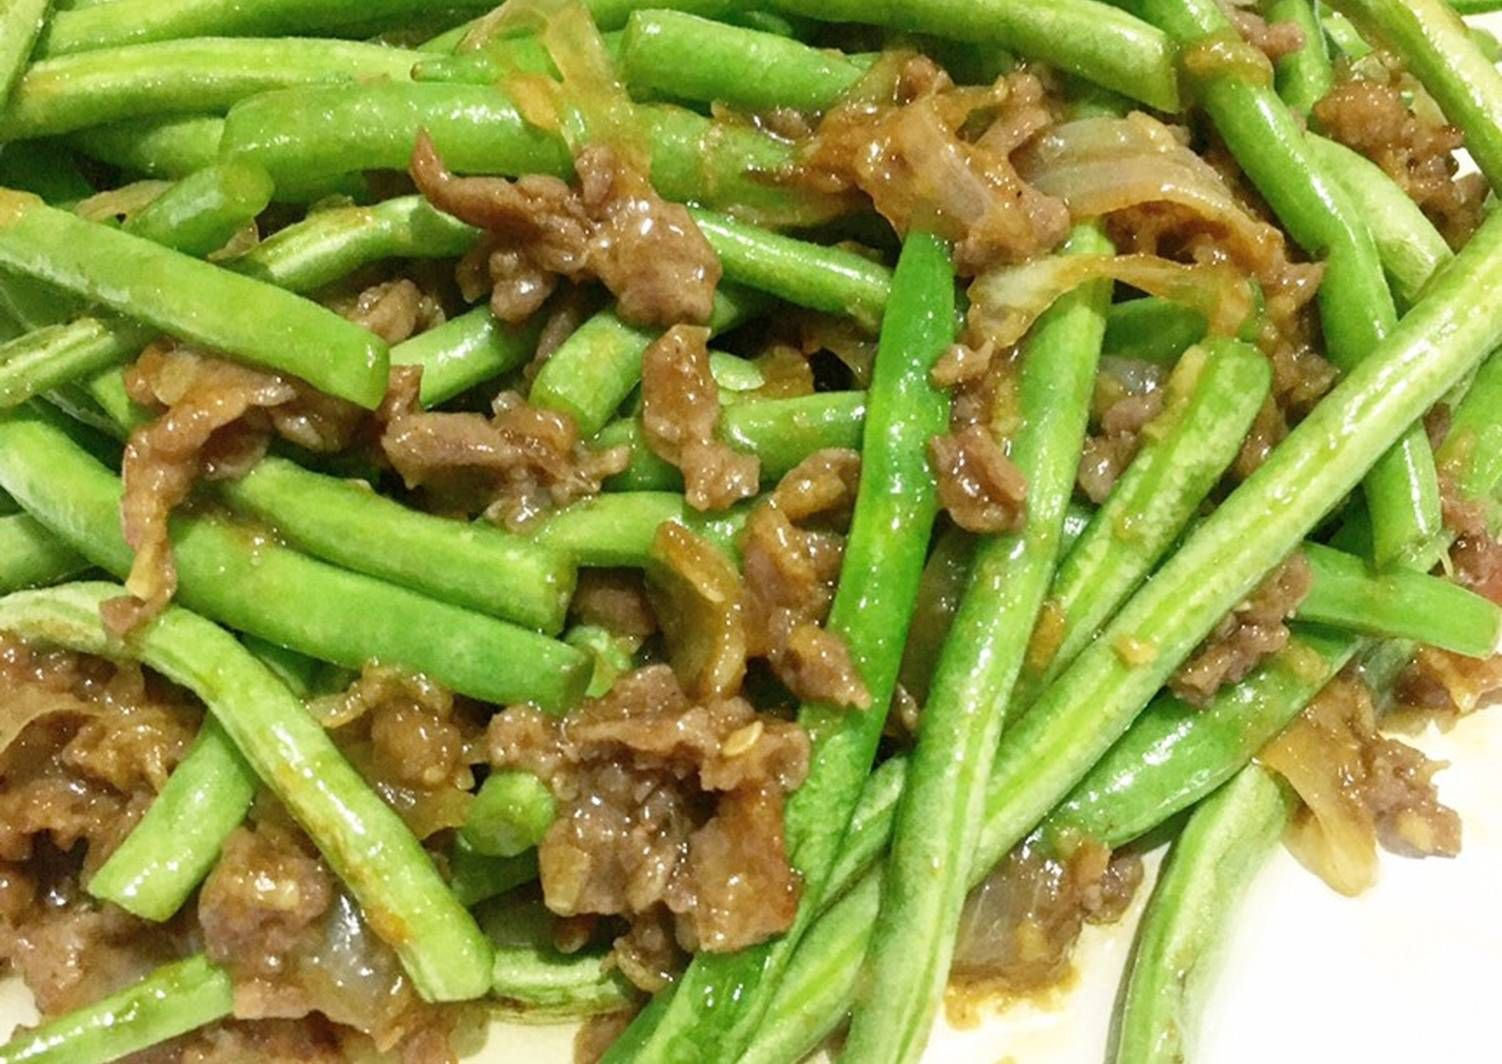 Resep Tumis Buncis Daging Cincang Ala Resto Ta Wan 5resepterbaruku Oleh Luna Resep Di 2020 Resep Makanan Makanan Resep